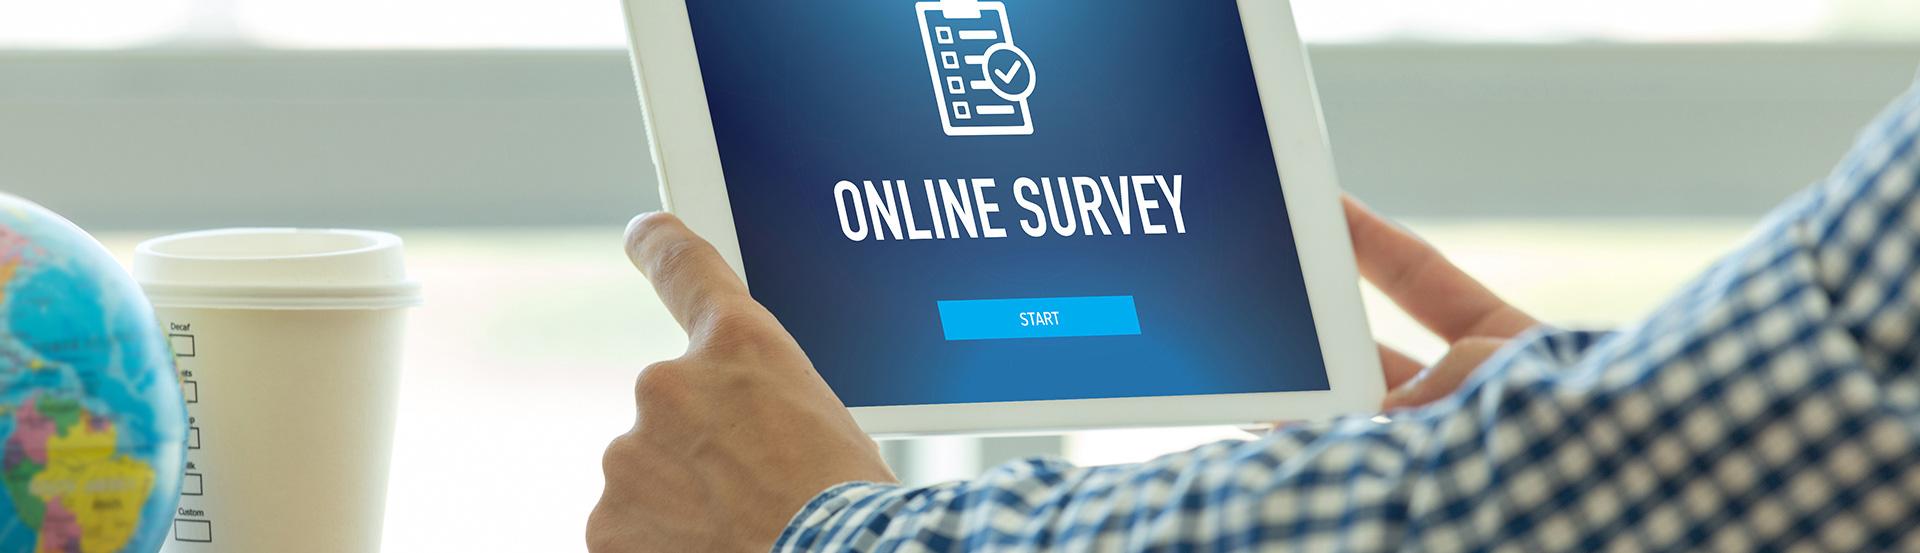 Publication of the online questionnaire